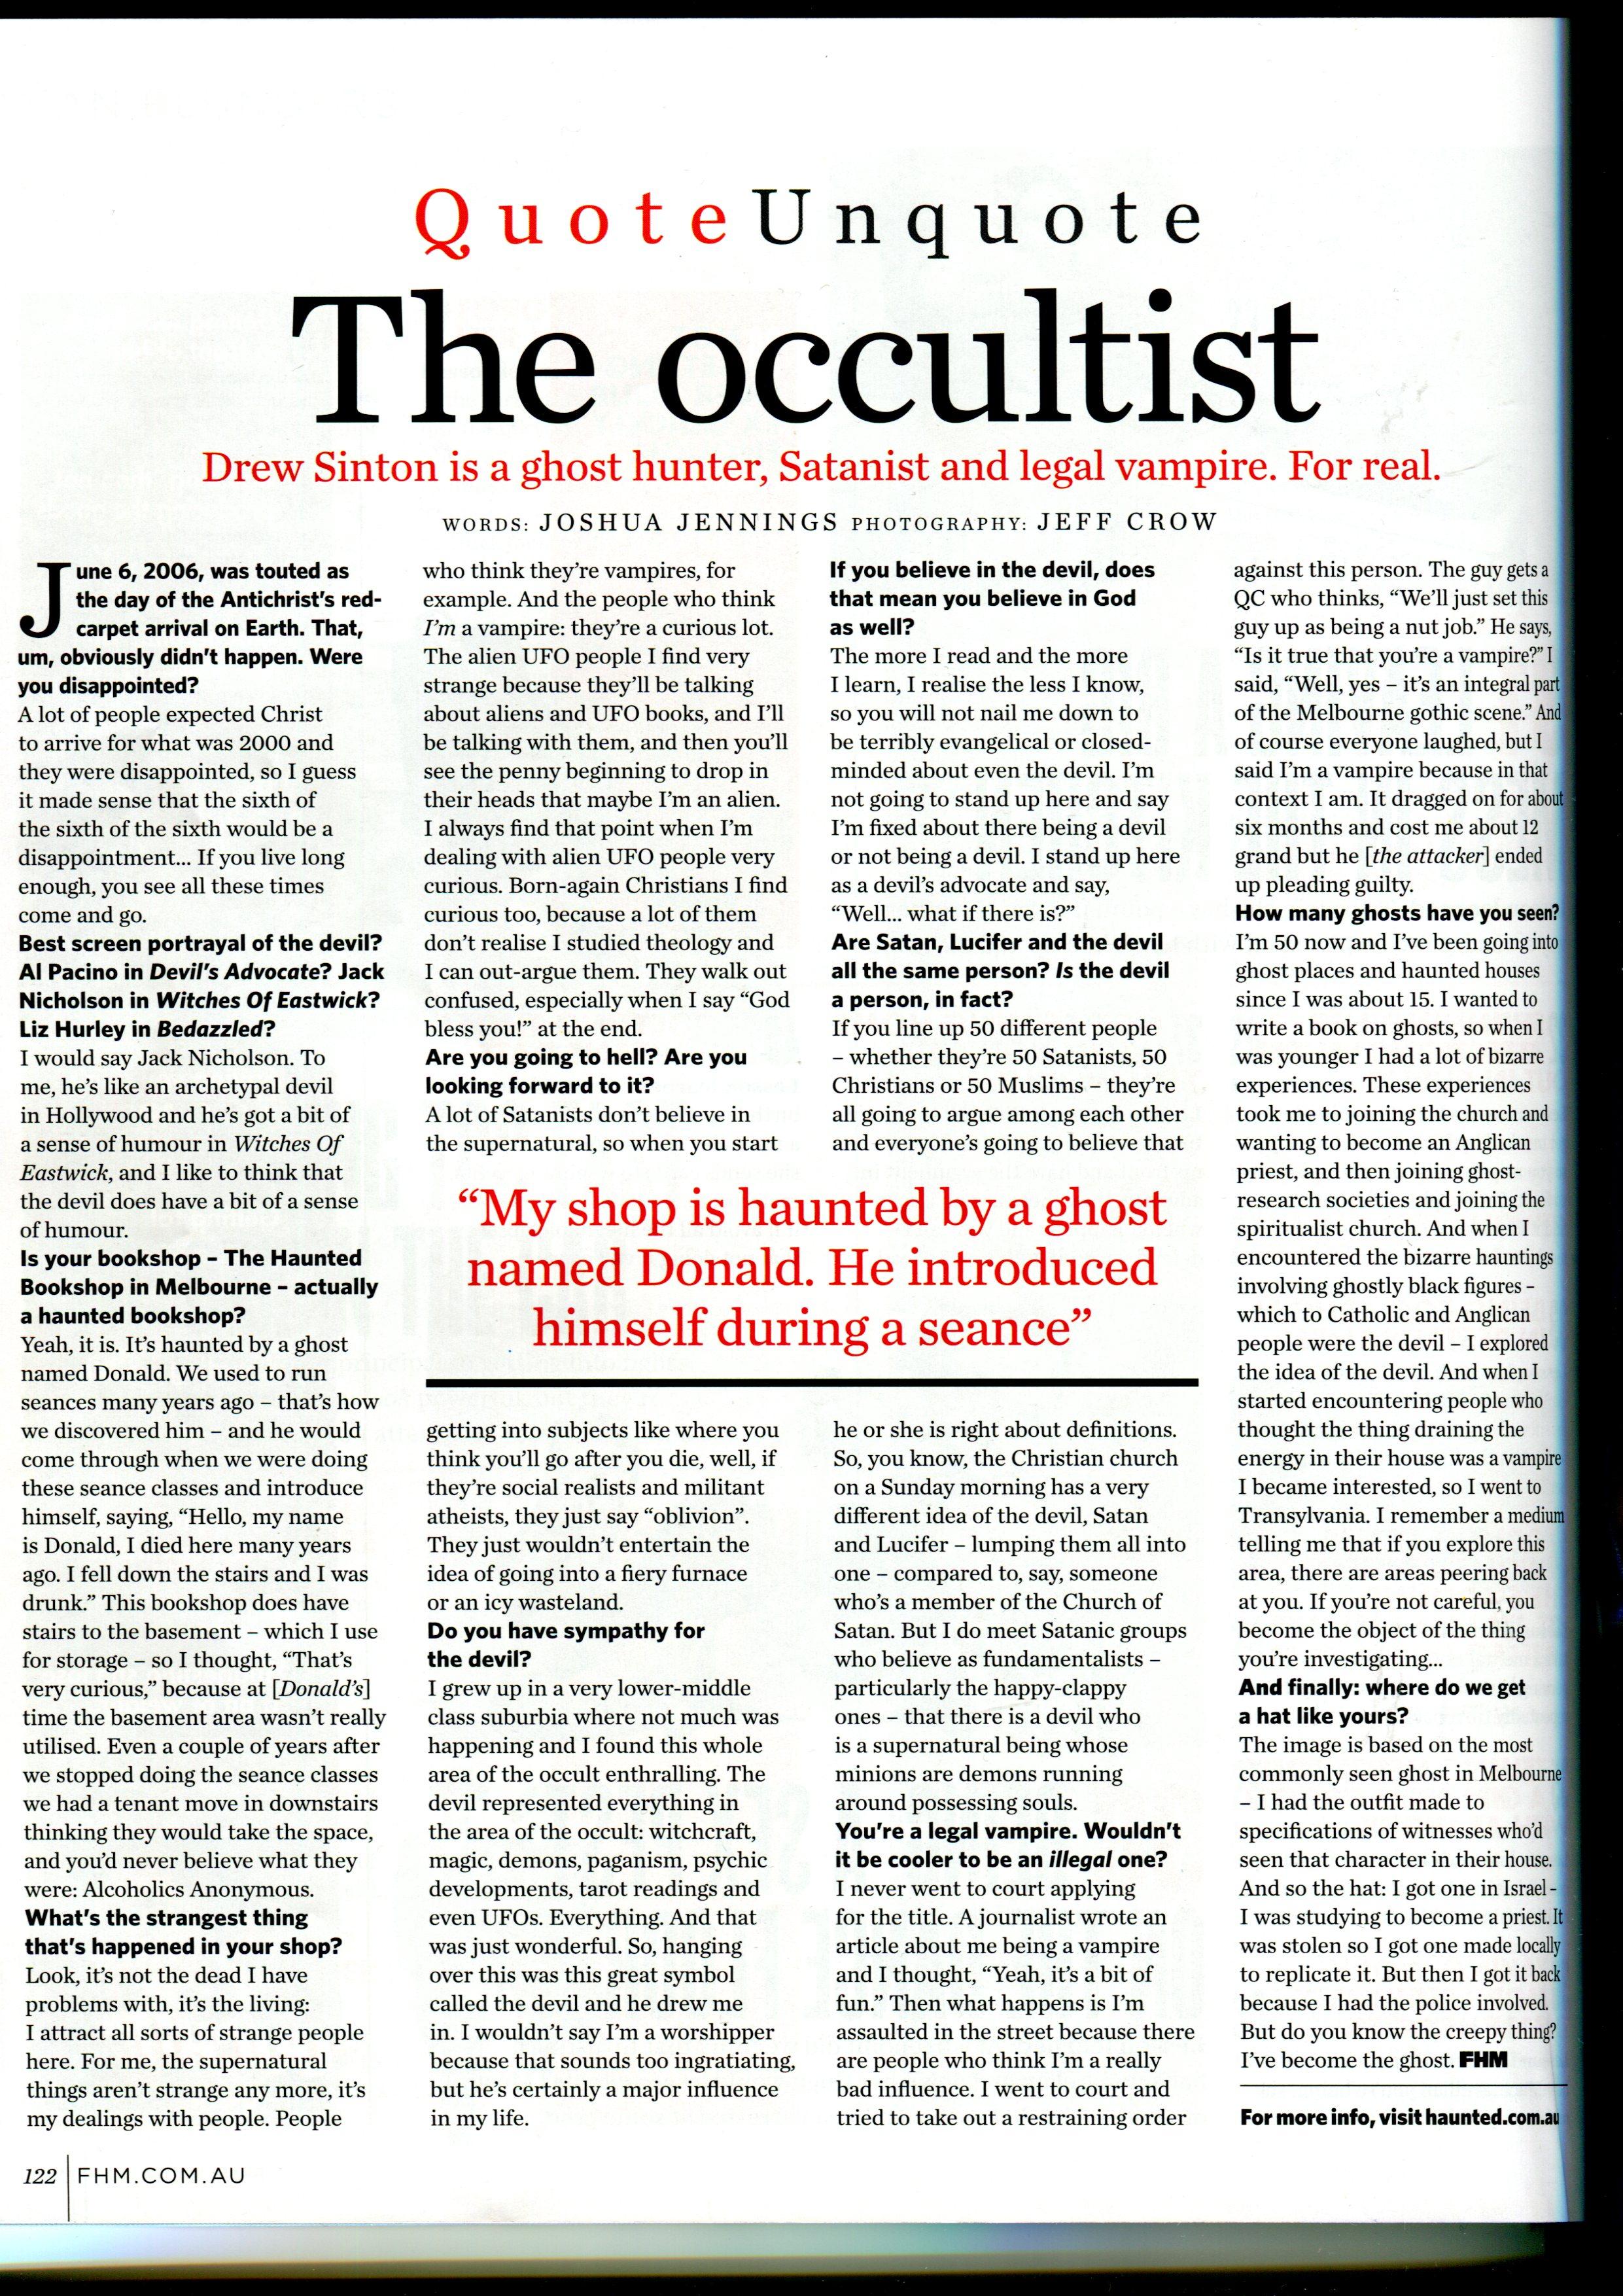 FHM INTERVIEW WITH GHOST HUNTER, SATANIST, LEGAL VAMPIRE DREW SINTON (3).jpg